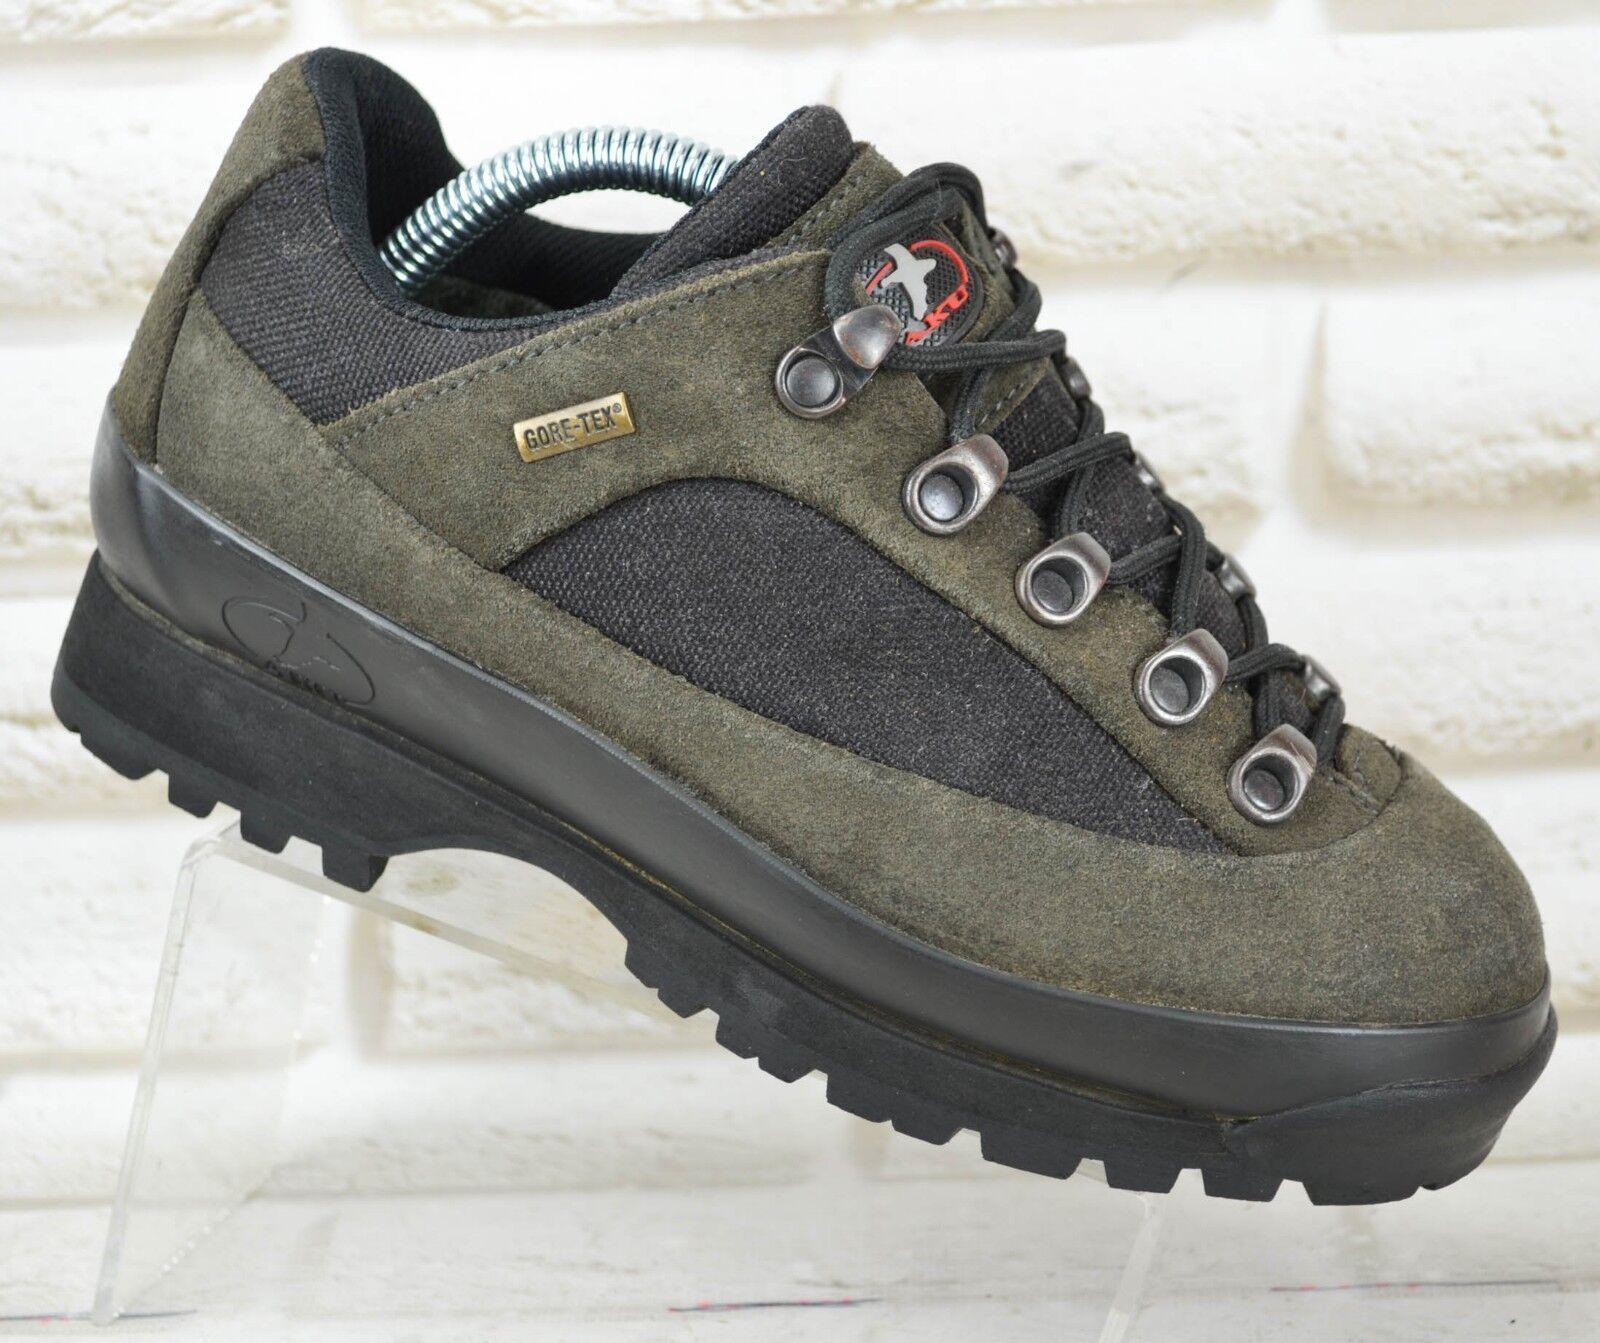 AKU GTX Damenschuhe Leder Outdoor Niedrig Walking Waterproof Stiefel Waterproof Walking Größe 3.5 UK 36 EU 284f53